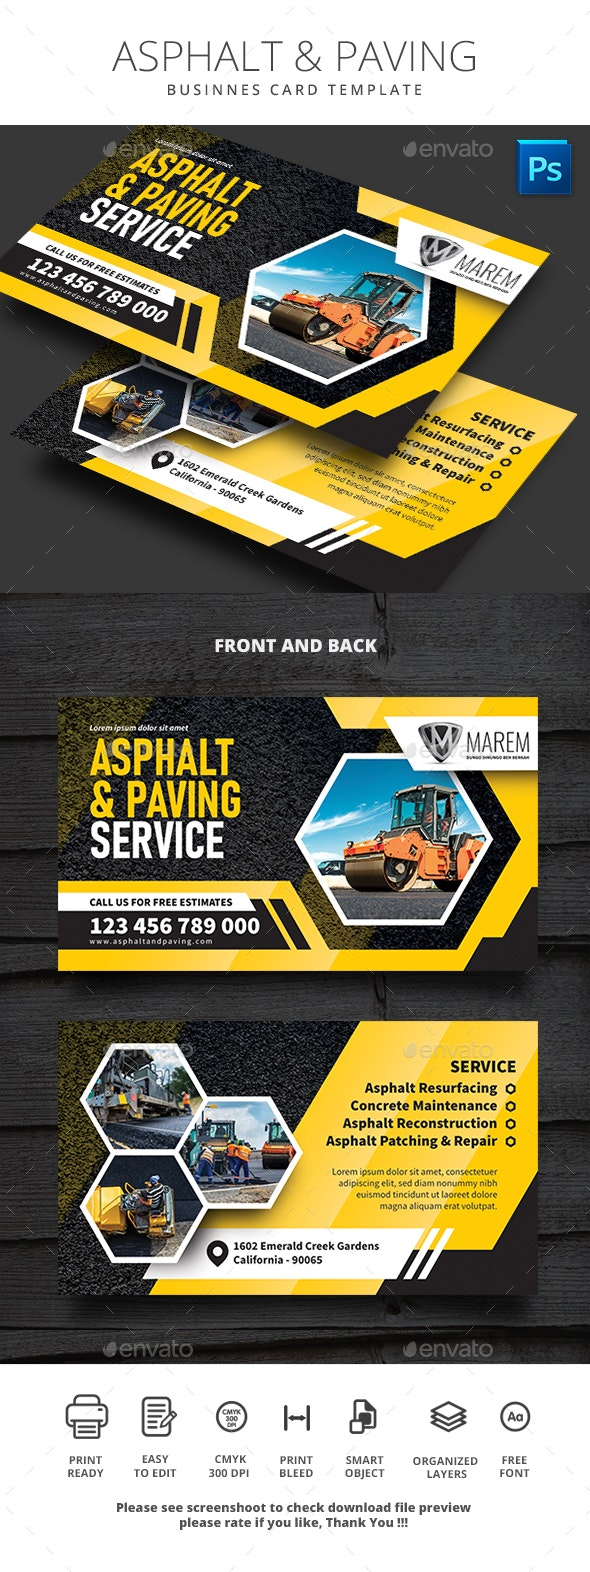 Asphalt and Paving Service Business Card - Business Cards Print Templates